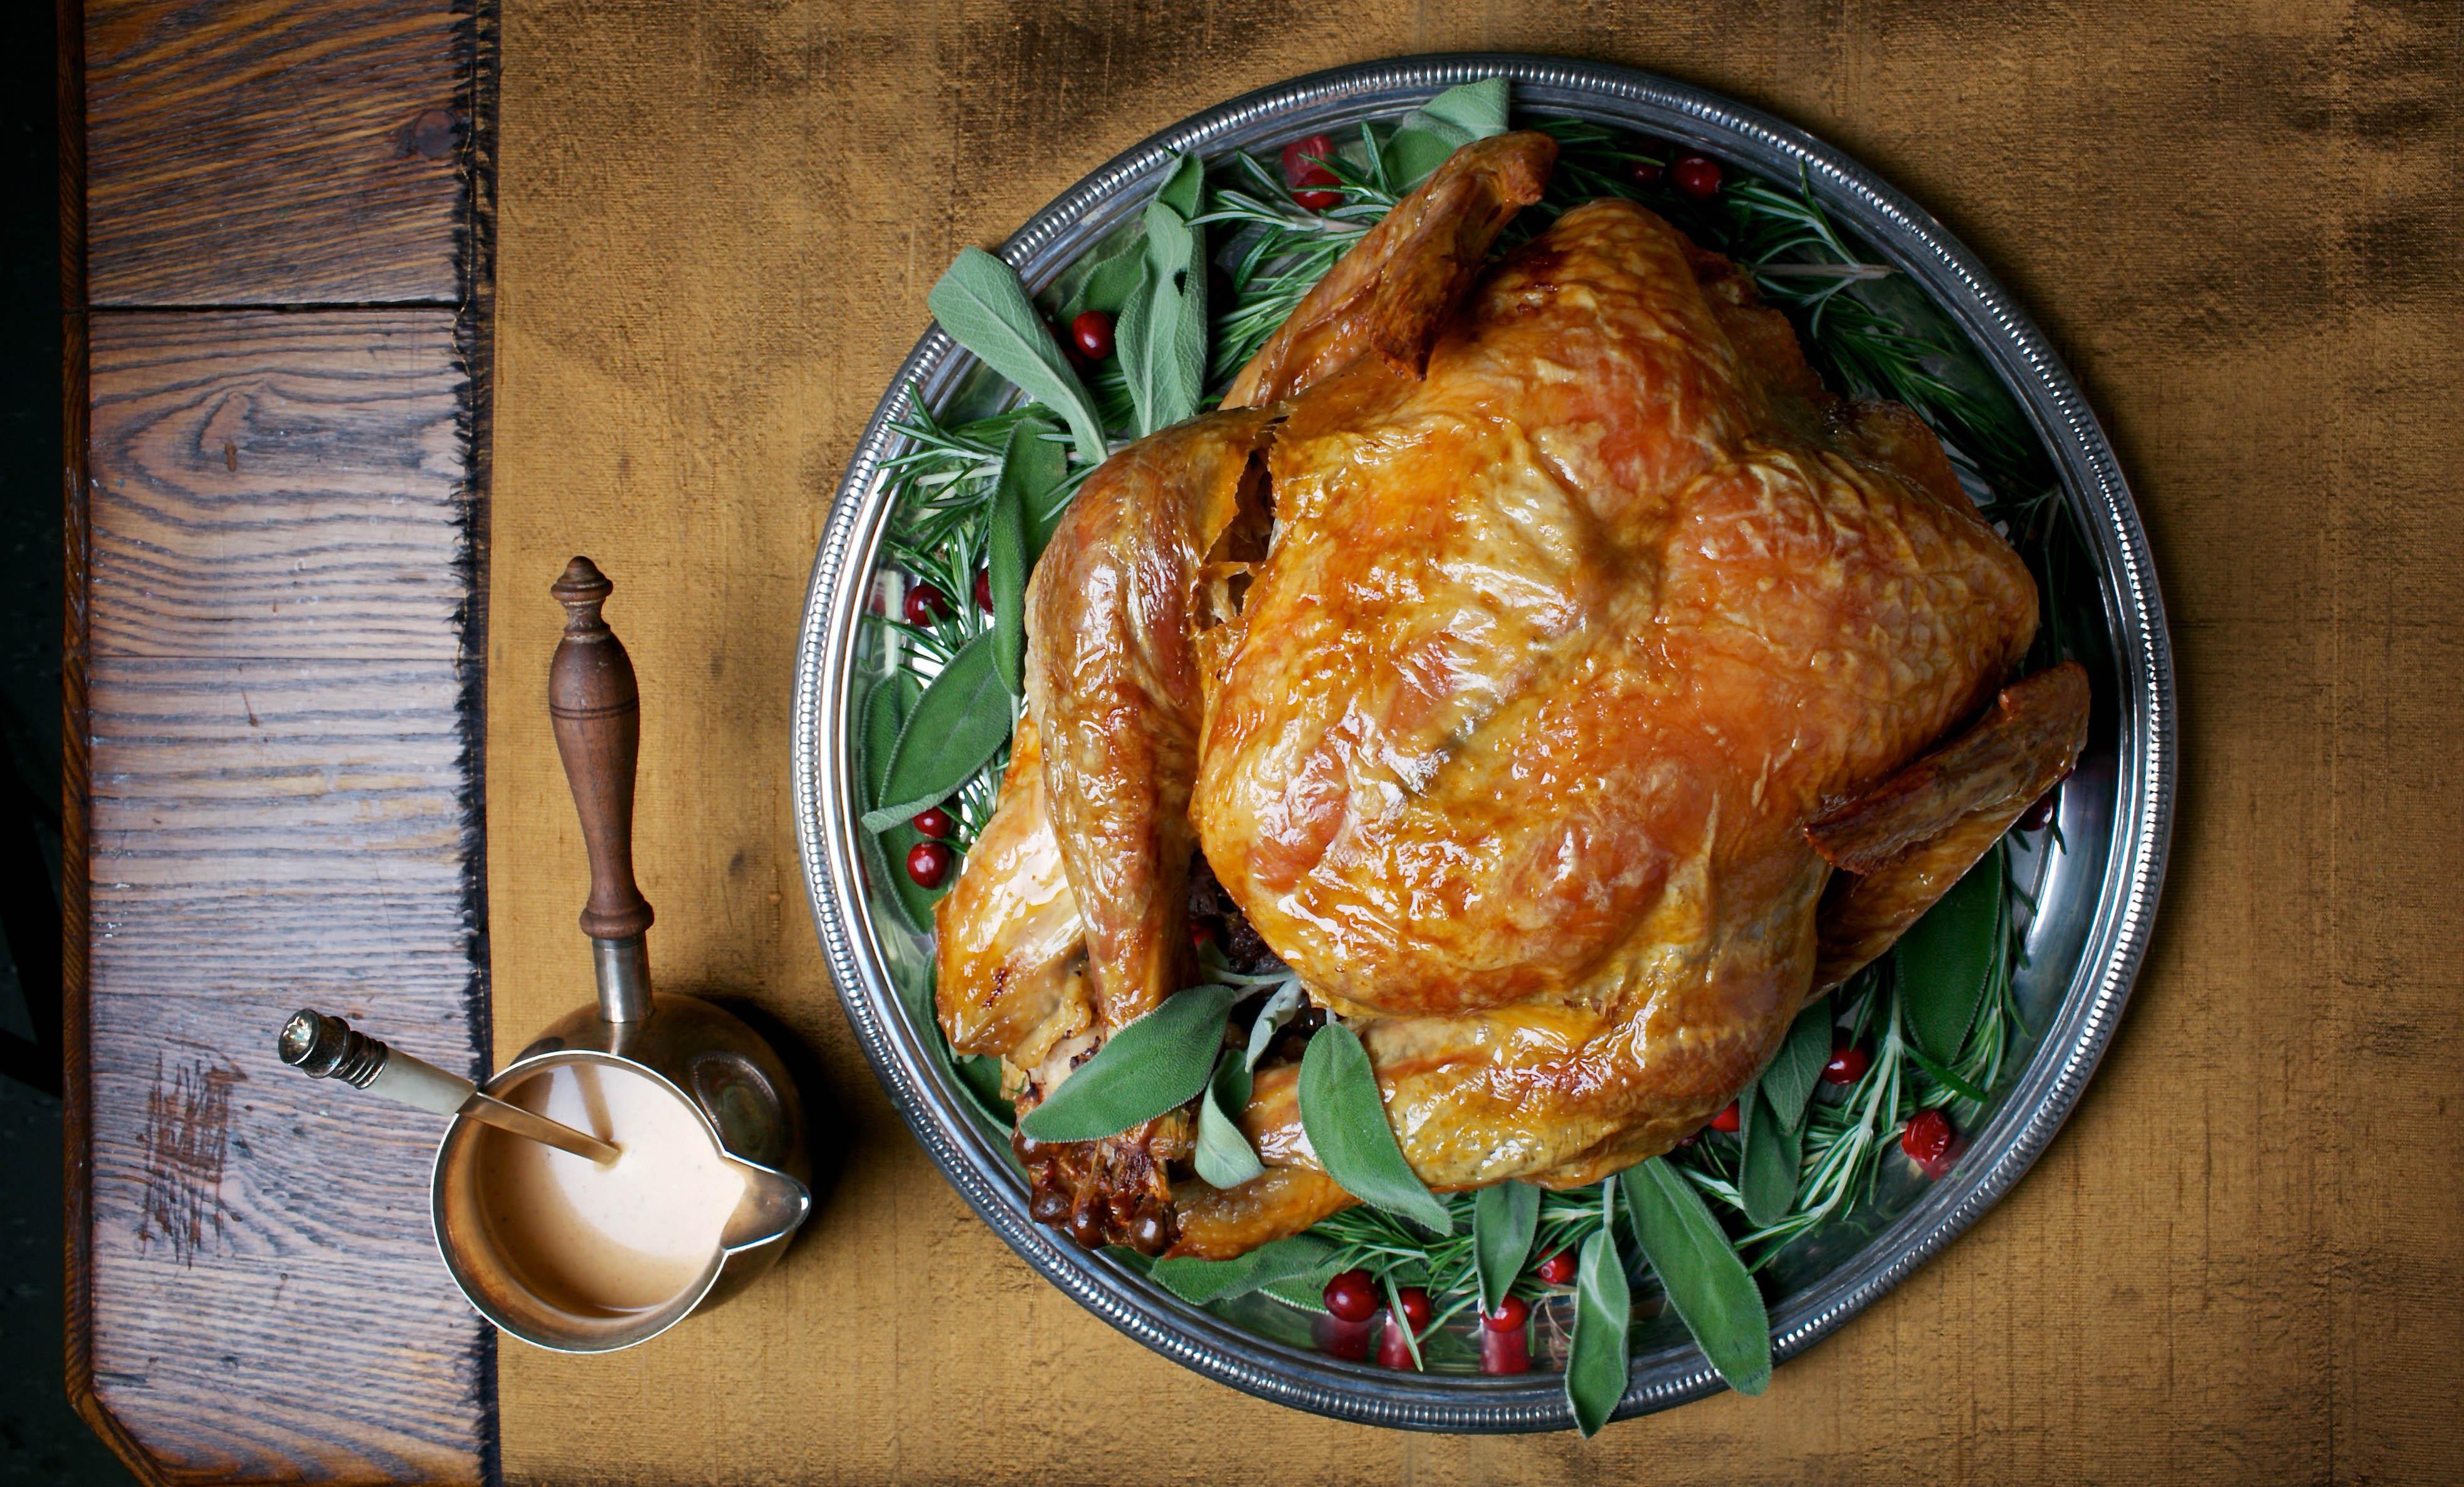 Gordon Ramsay - Christmas Turkey With Gravy  How to cook Christmas dinner according to Gordon Ramsay